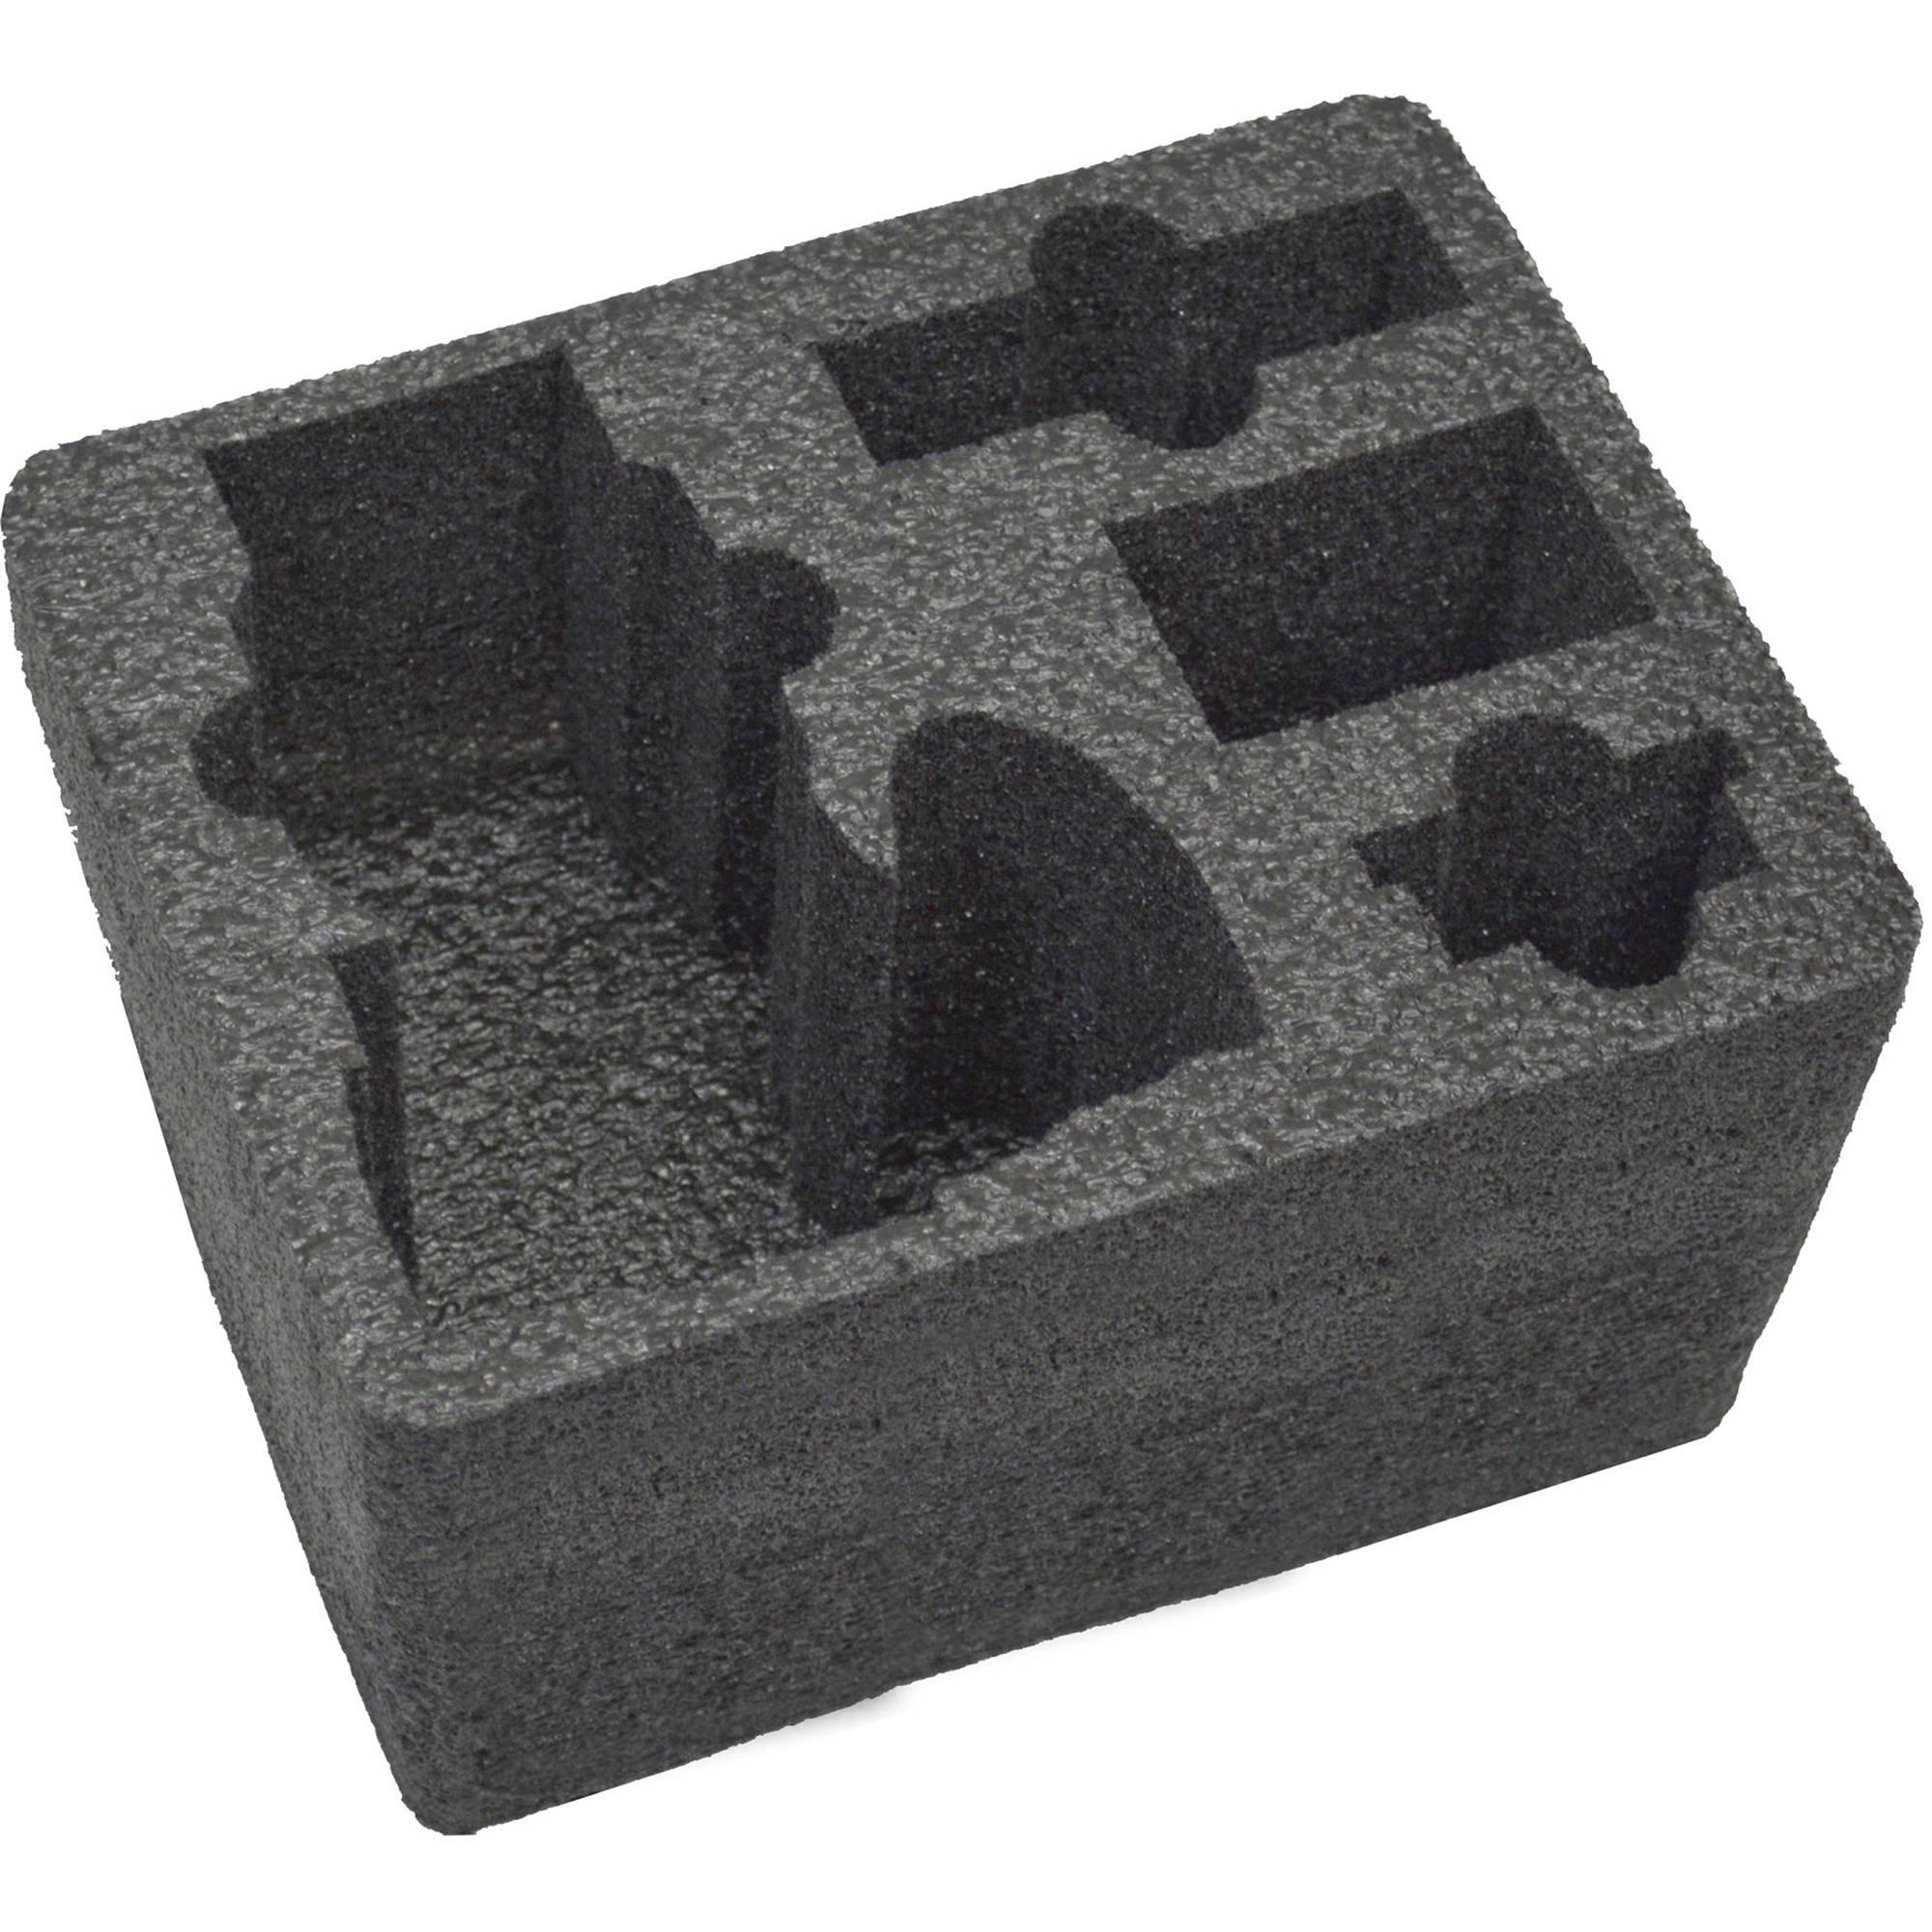 how to make custom foam case inserts